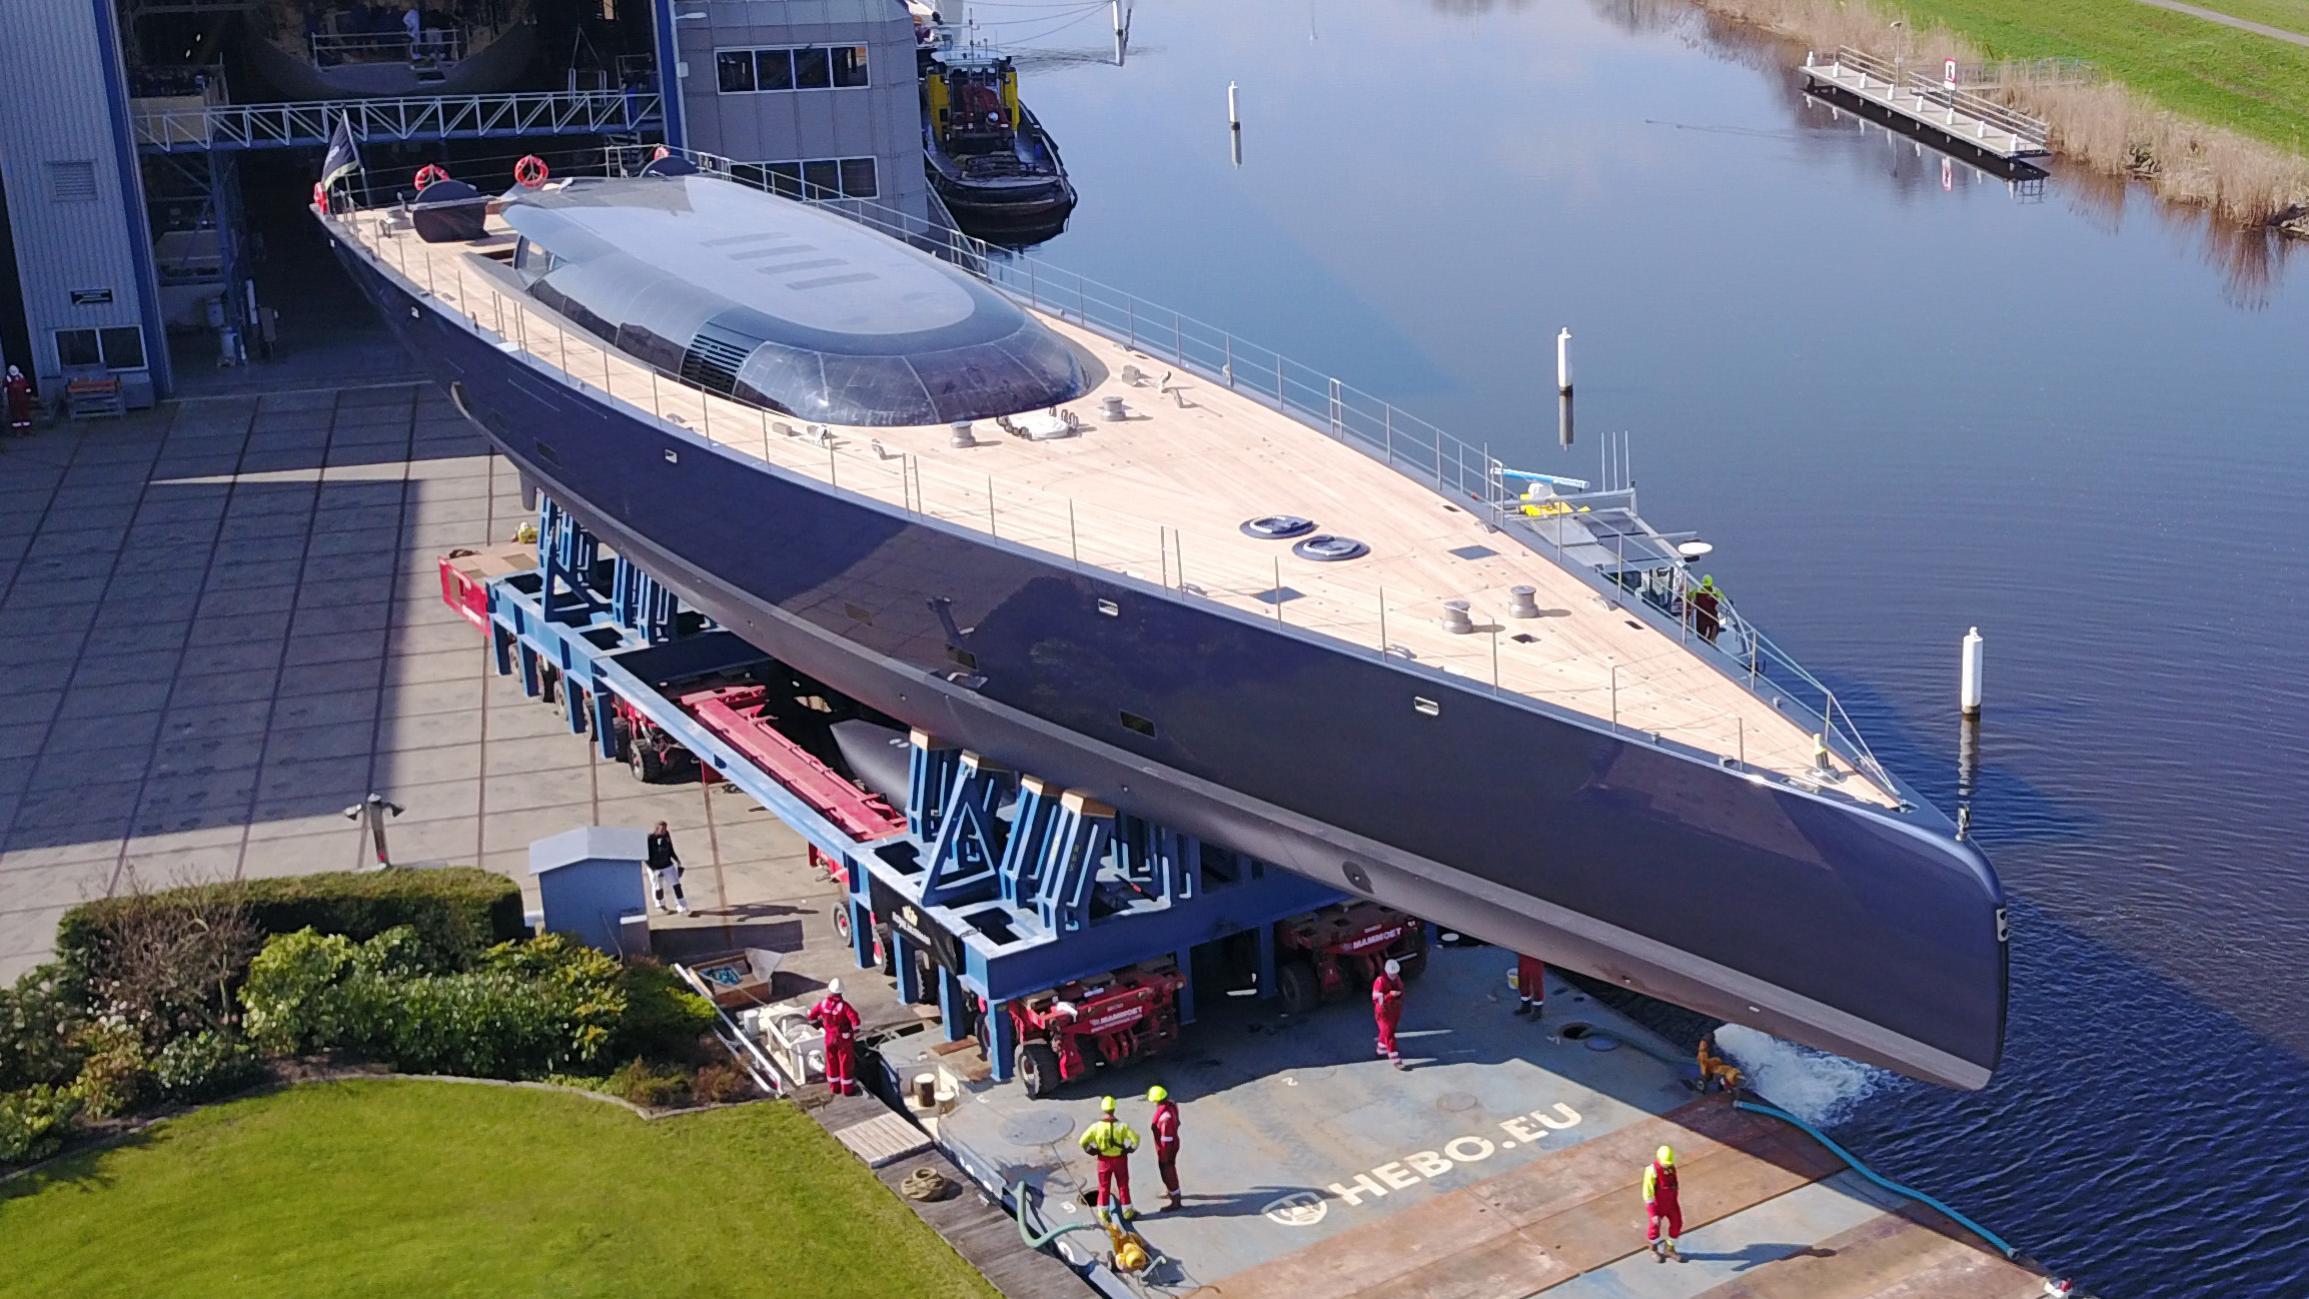 ngoni sailing yacht royal huisman 58m 2017 launch half profile